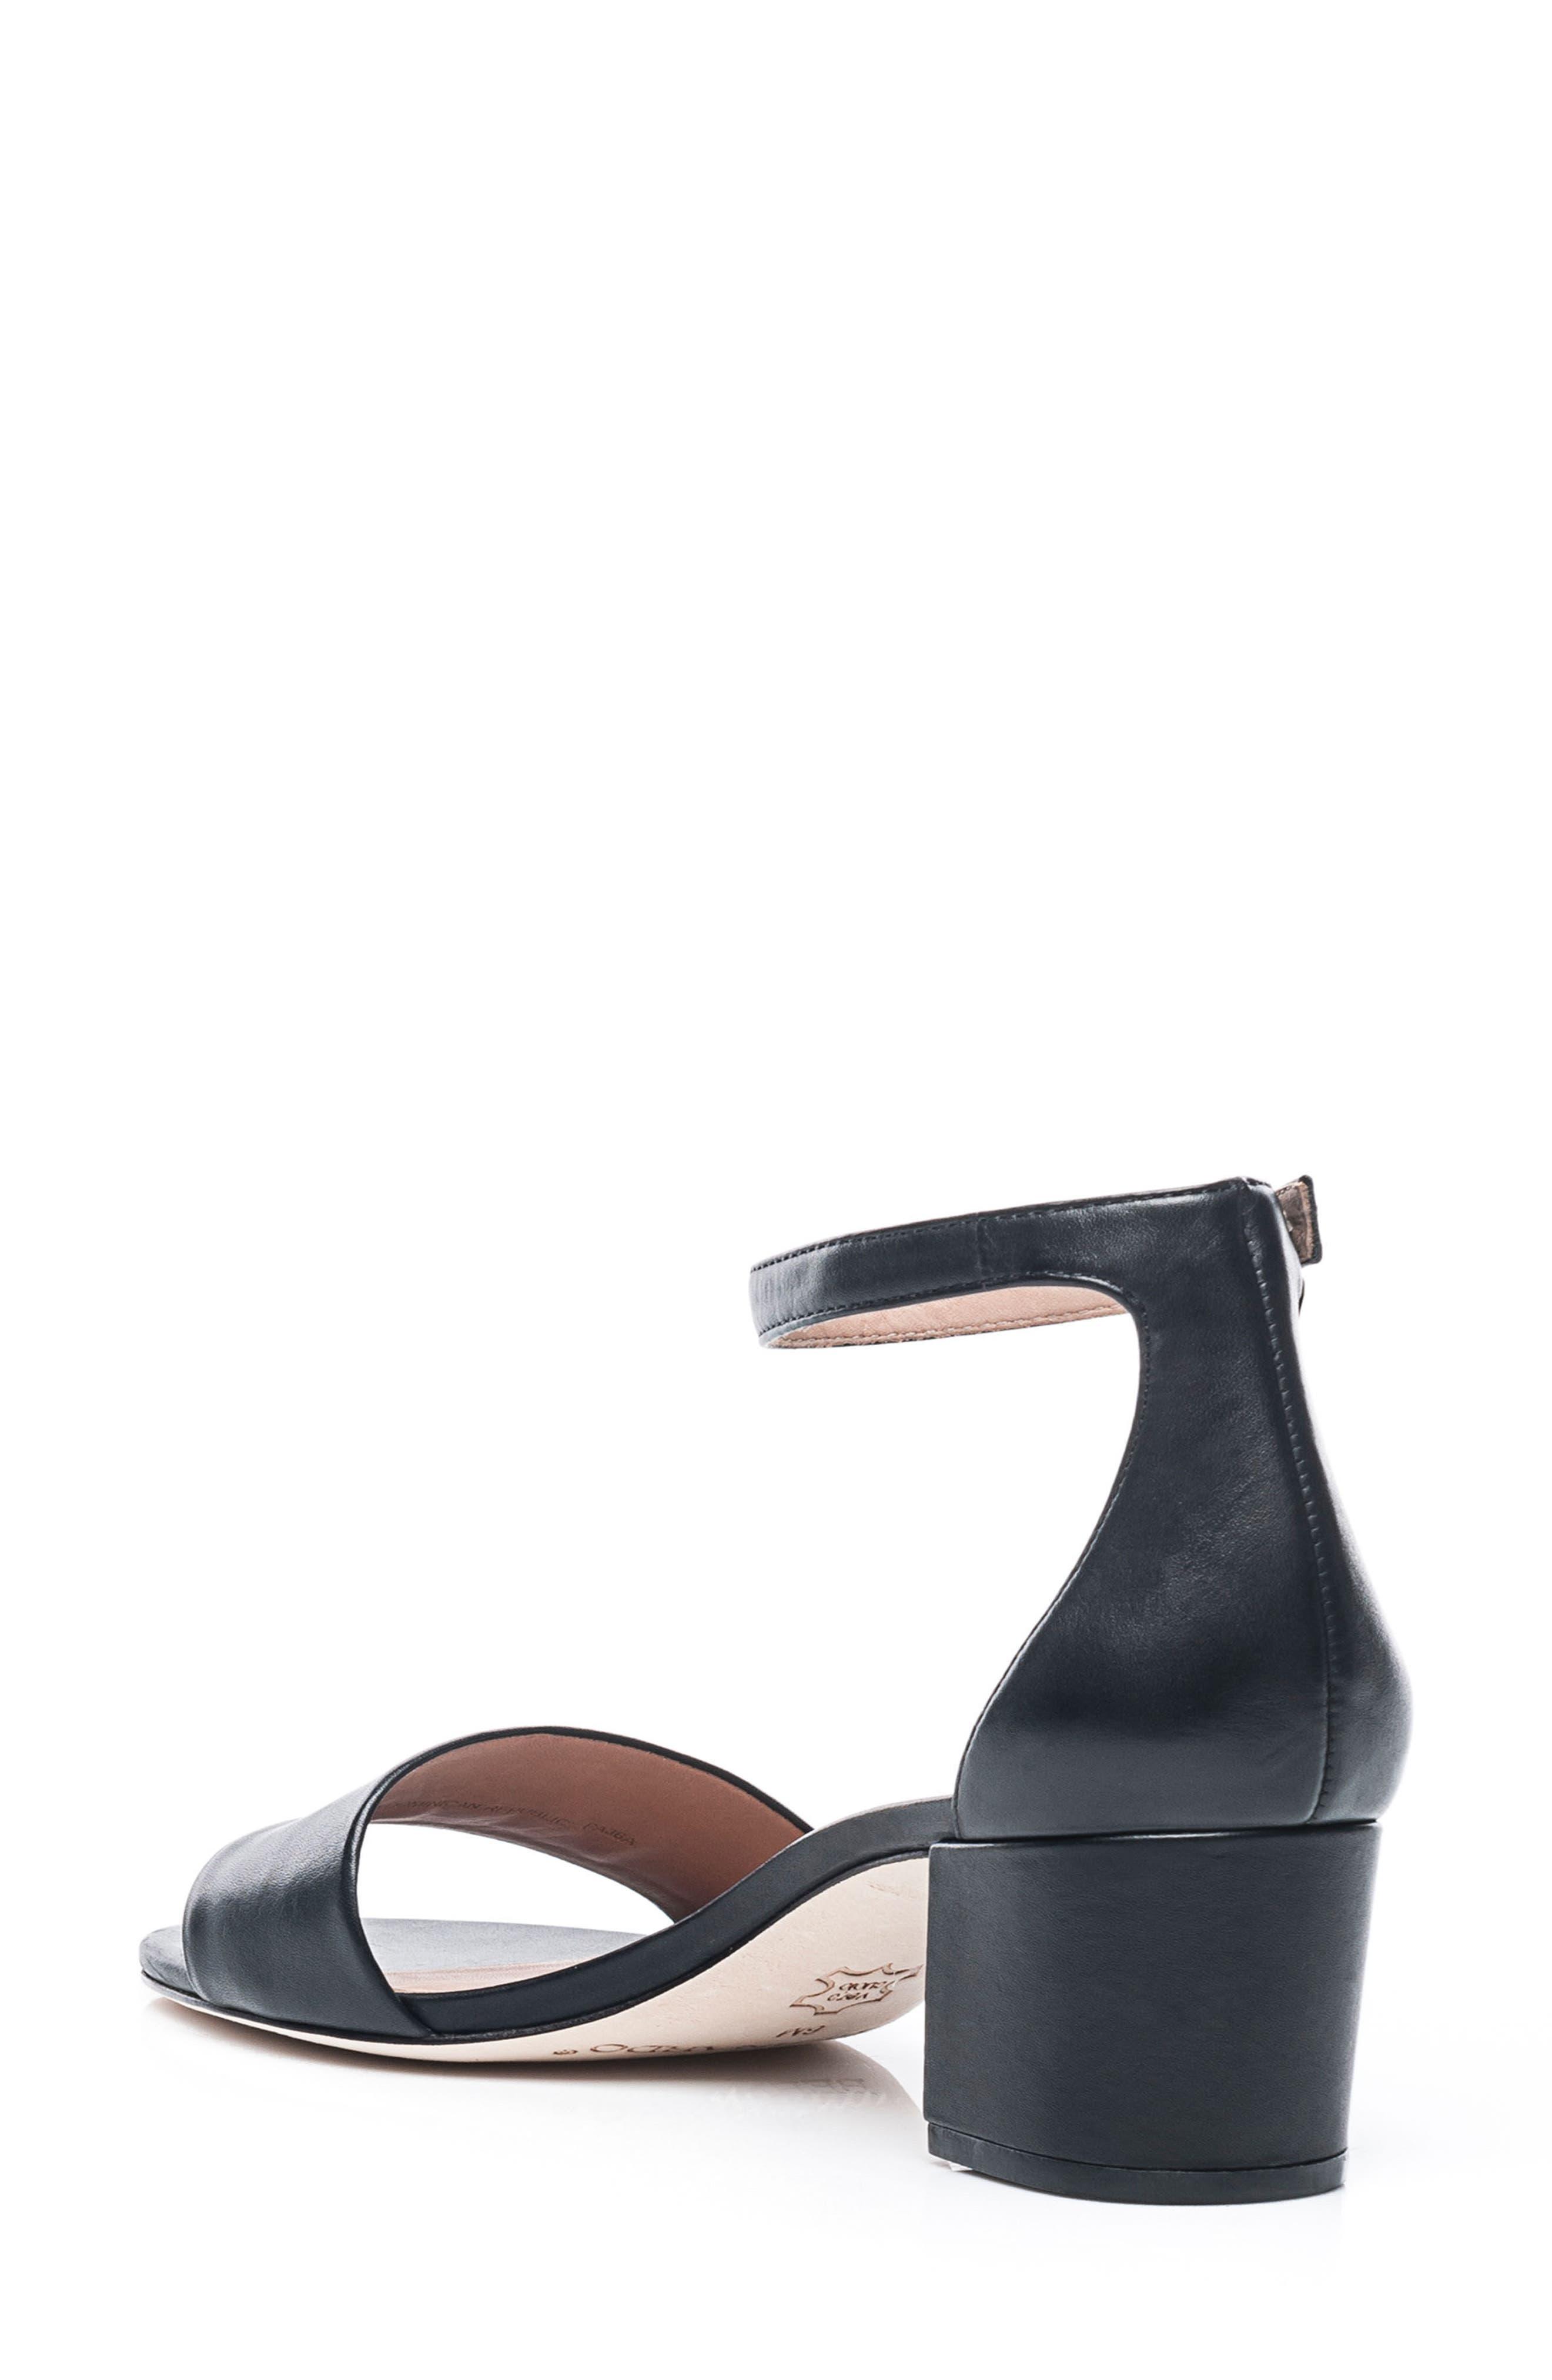 BERNARDO, Belinda Ankle Strap Sandal, Alternate thumbnail 2, color, BLACK LEATHER